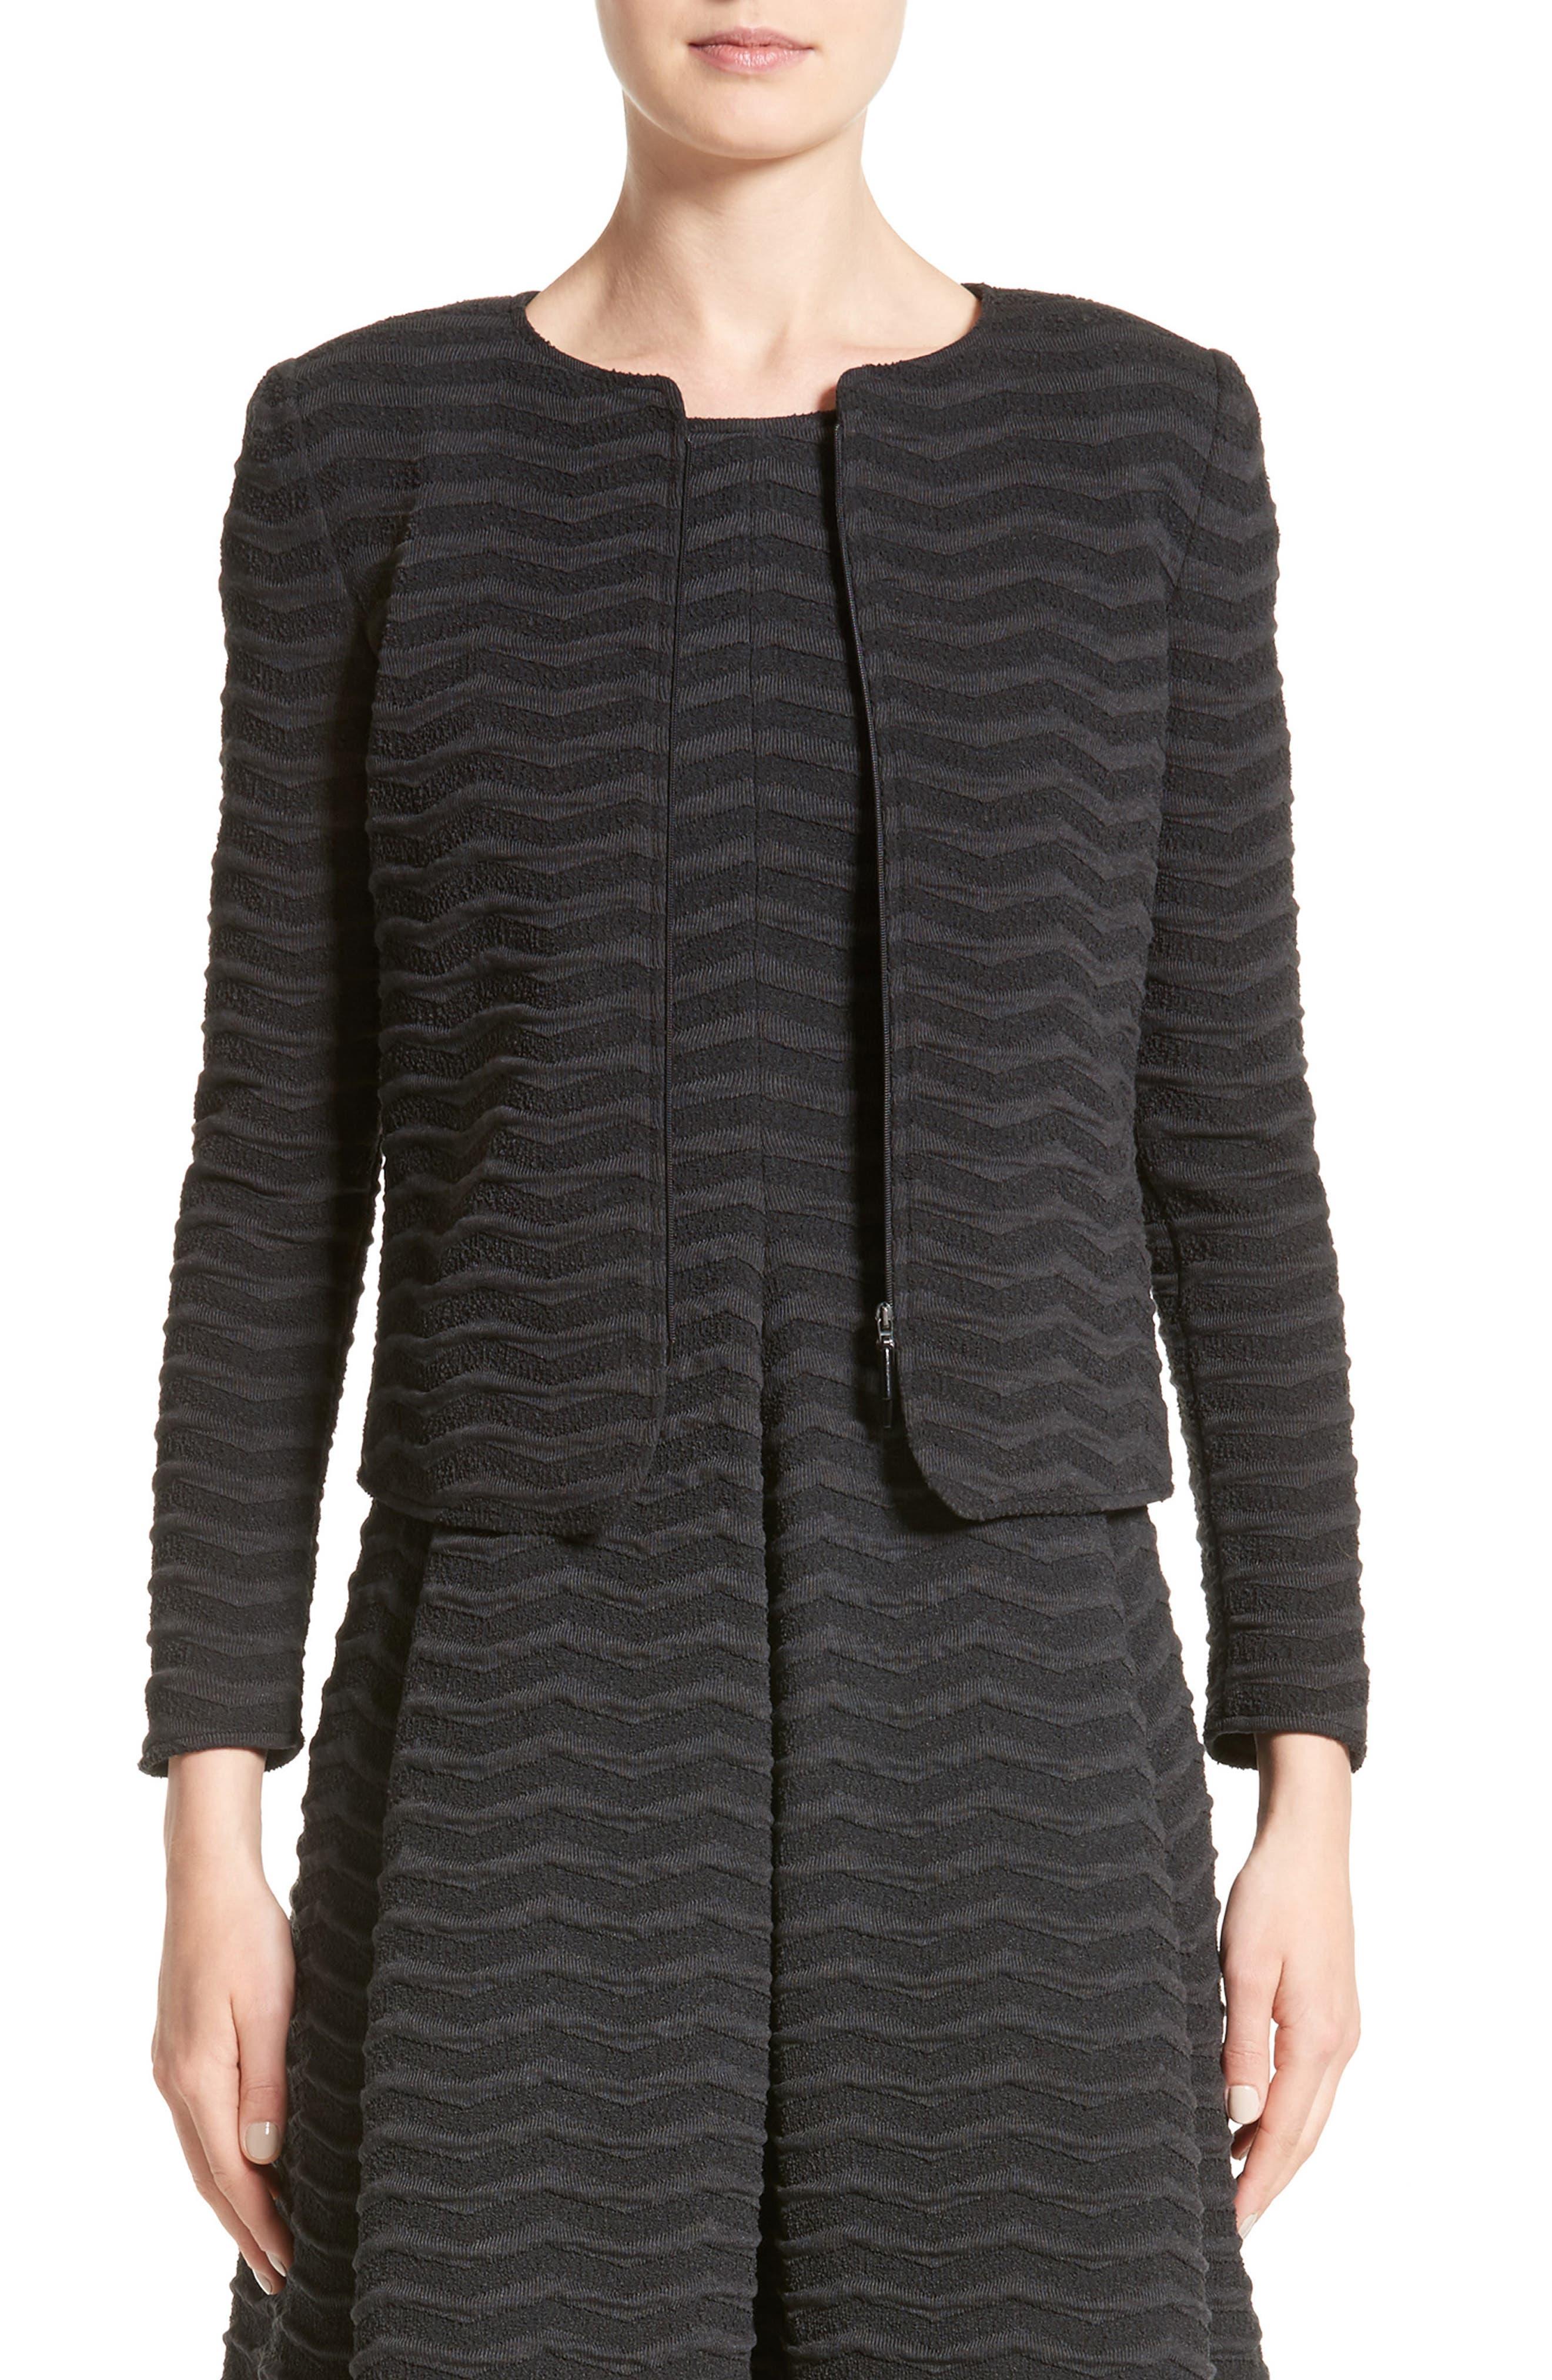 Alternate Image 1 Selected - Armani Collezioni Embossed Jacquard Jersey Jacket